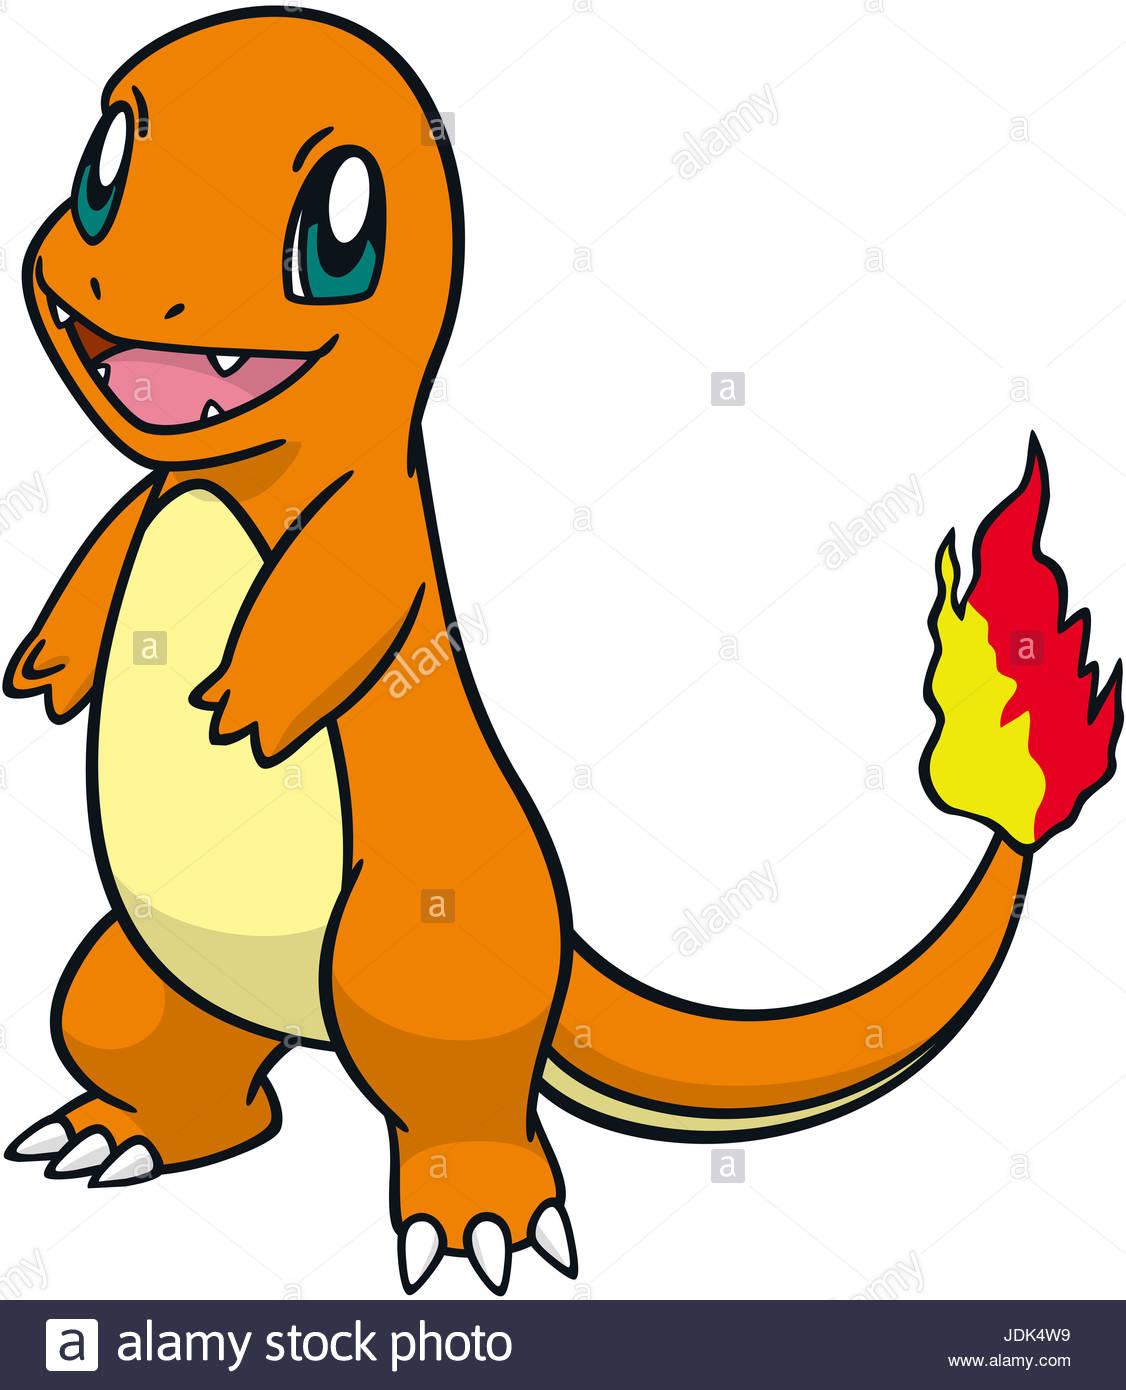 charmander illustration pokemon go game stock photo 146094405 alamy